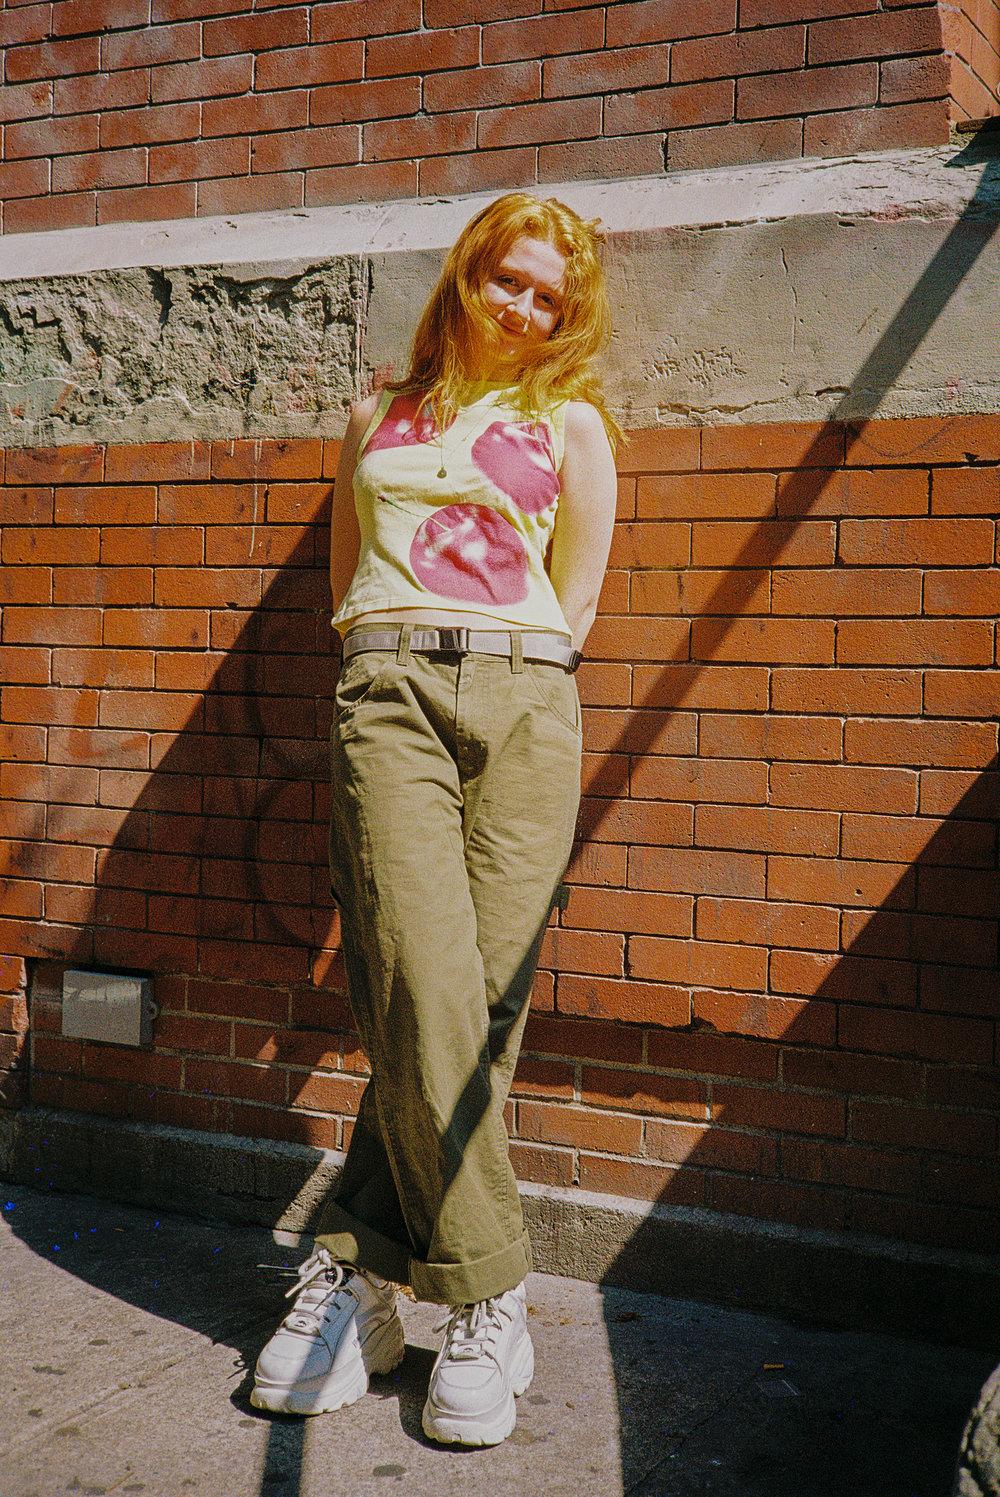 Franscis during work in SoHo in her cherry shirt